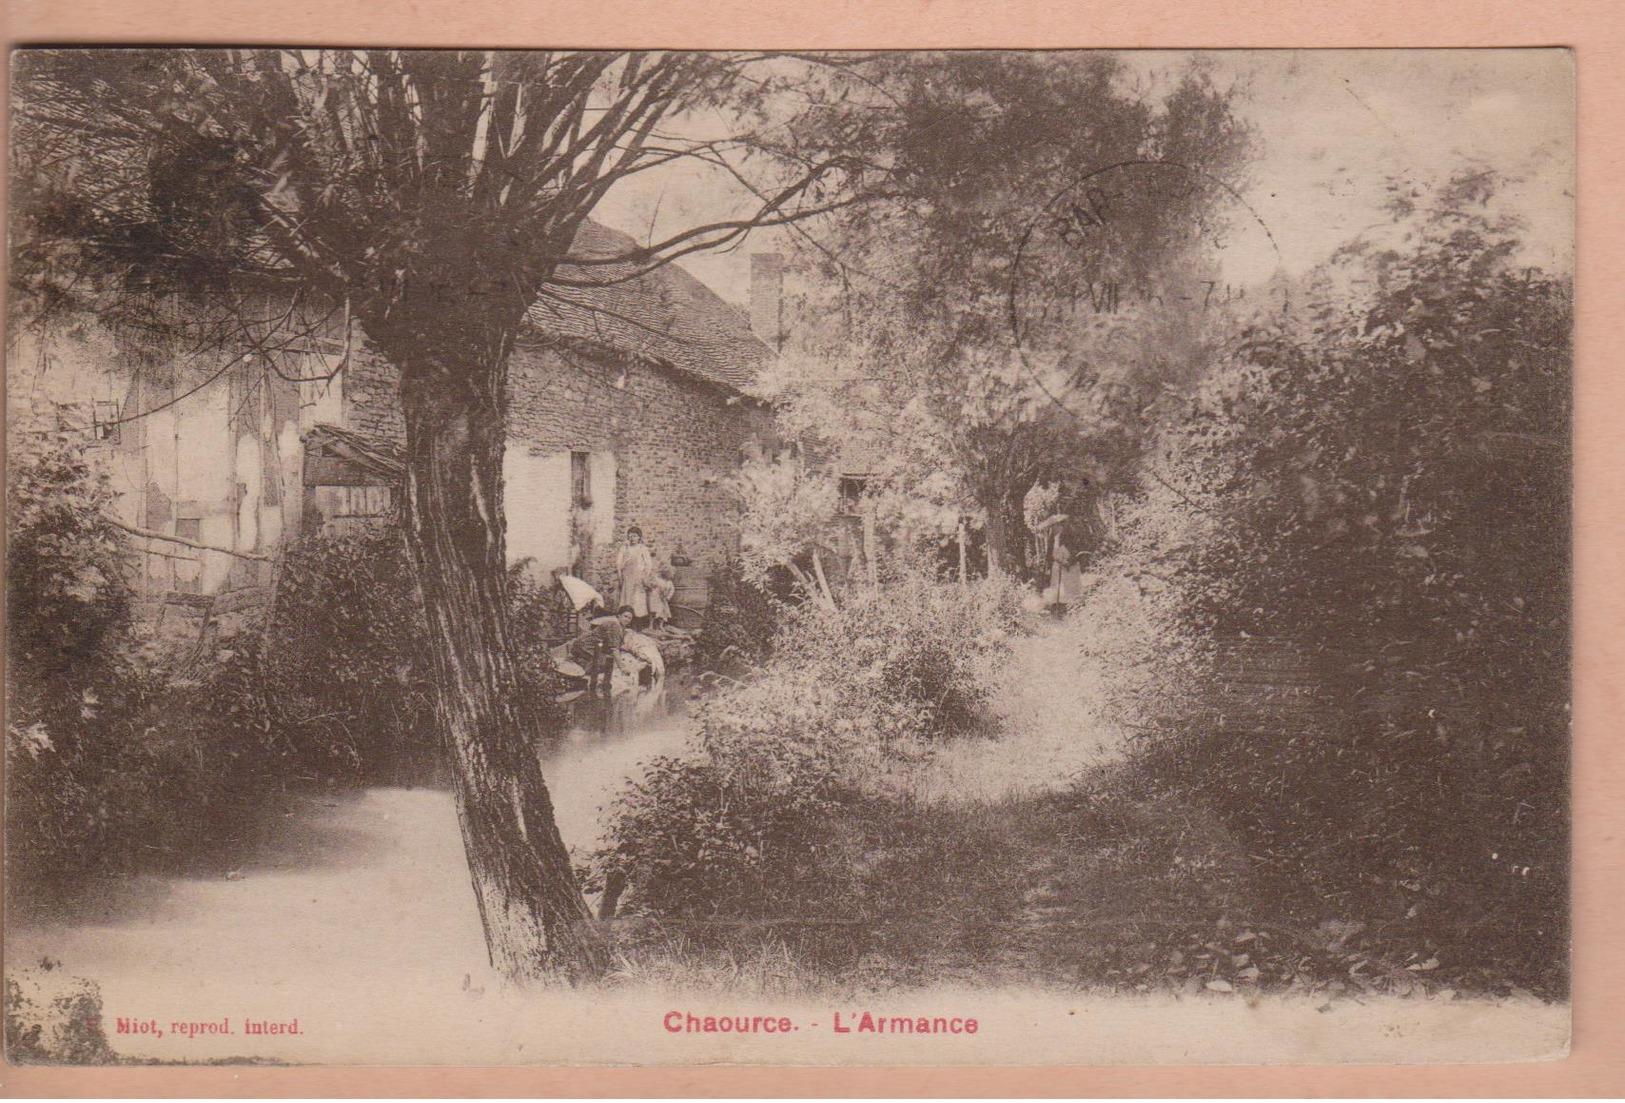 Chaource - L'Armance - Chaource